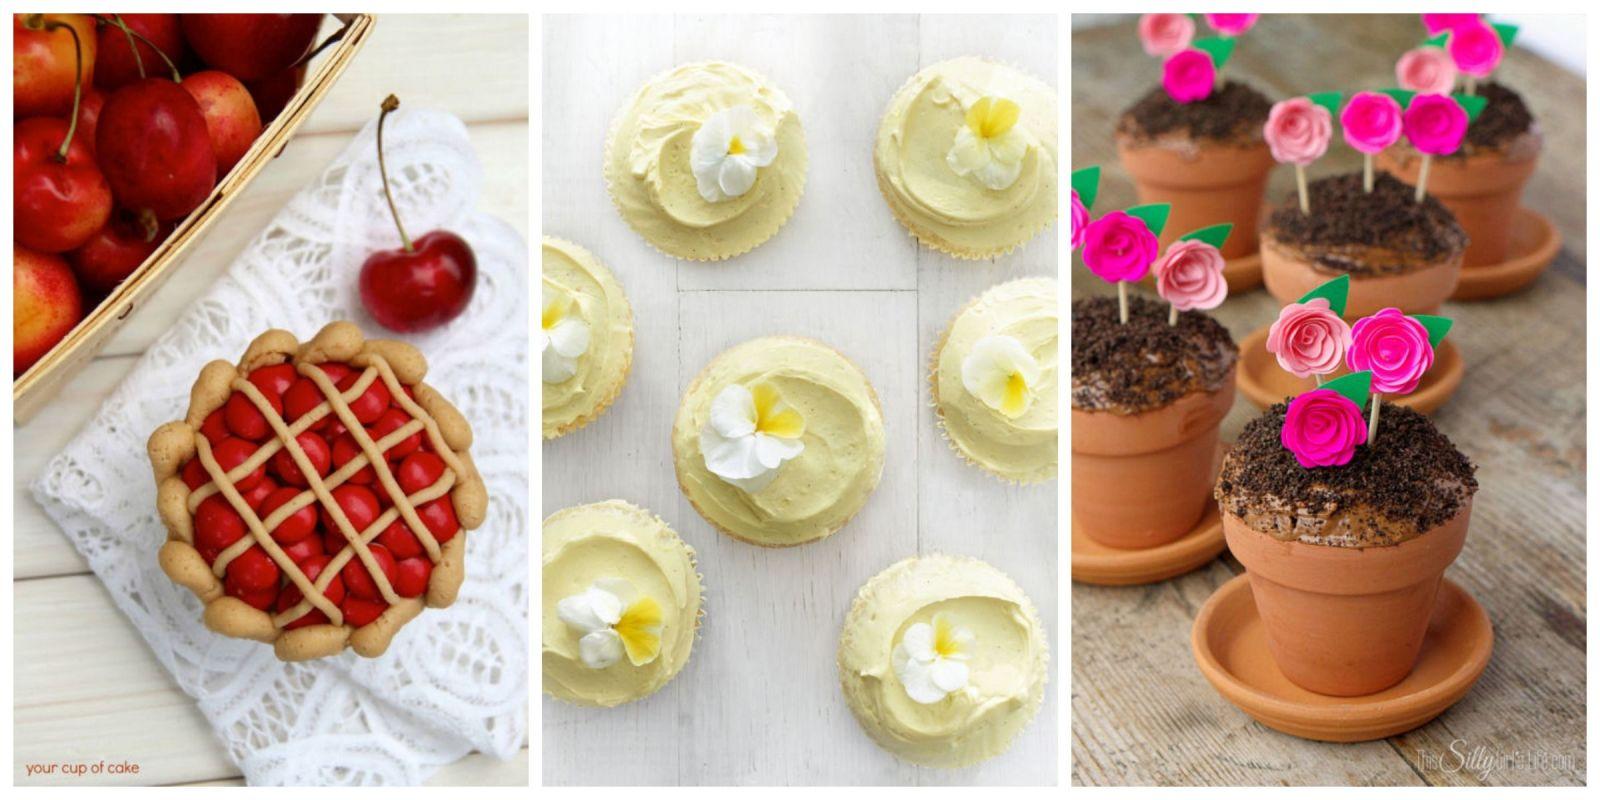 Fun and Easy Cupcake Decorating Idea